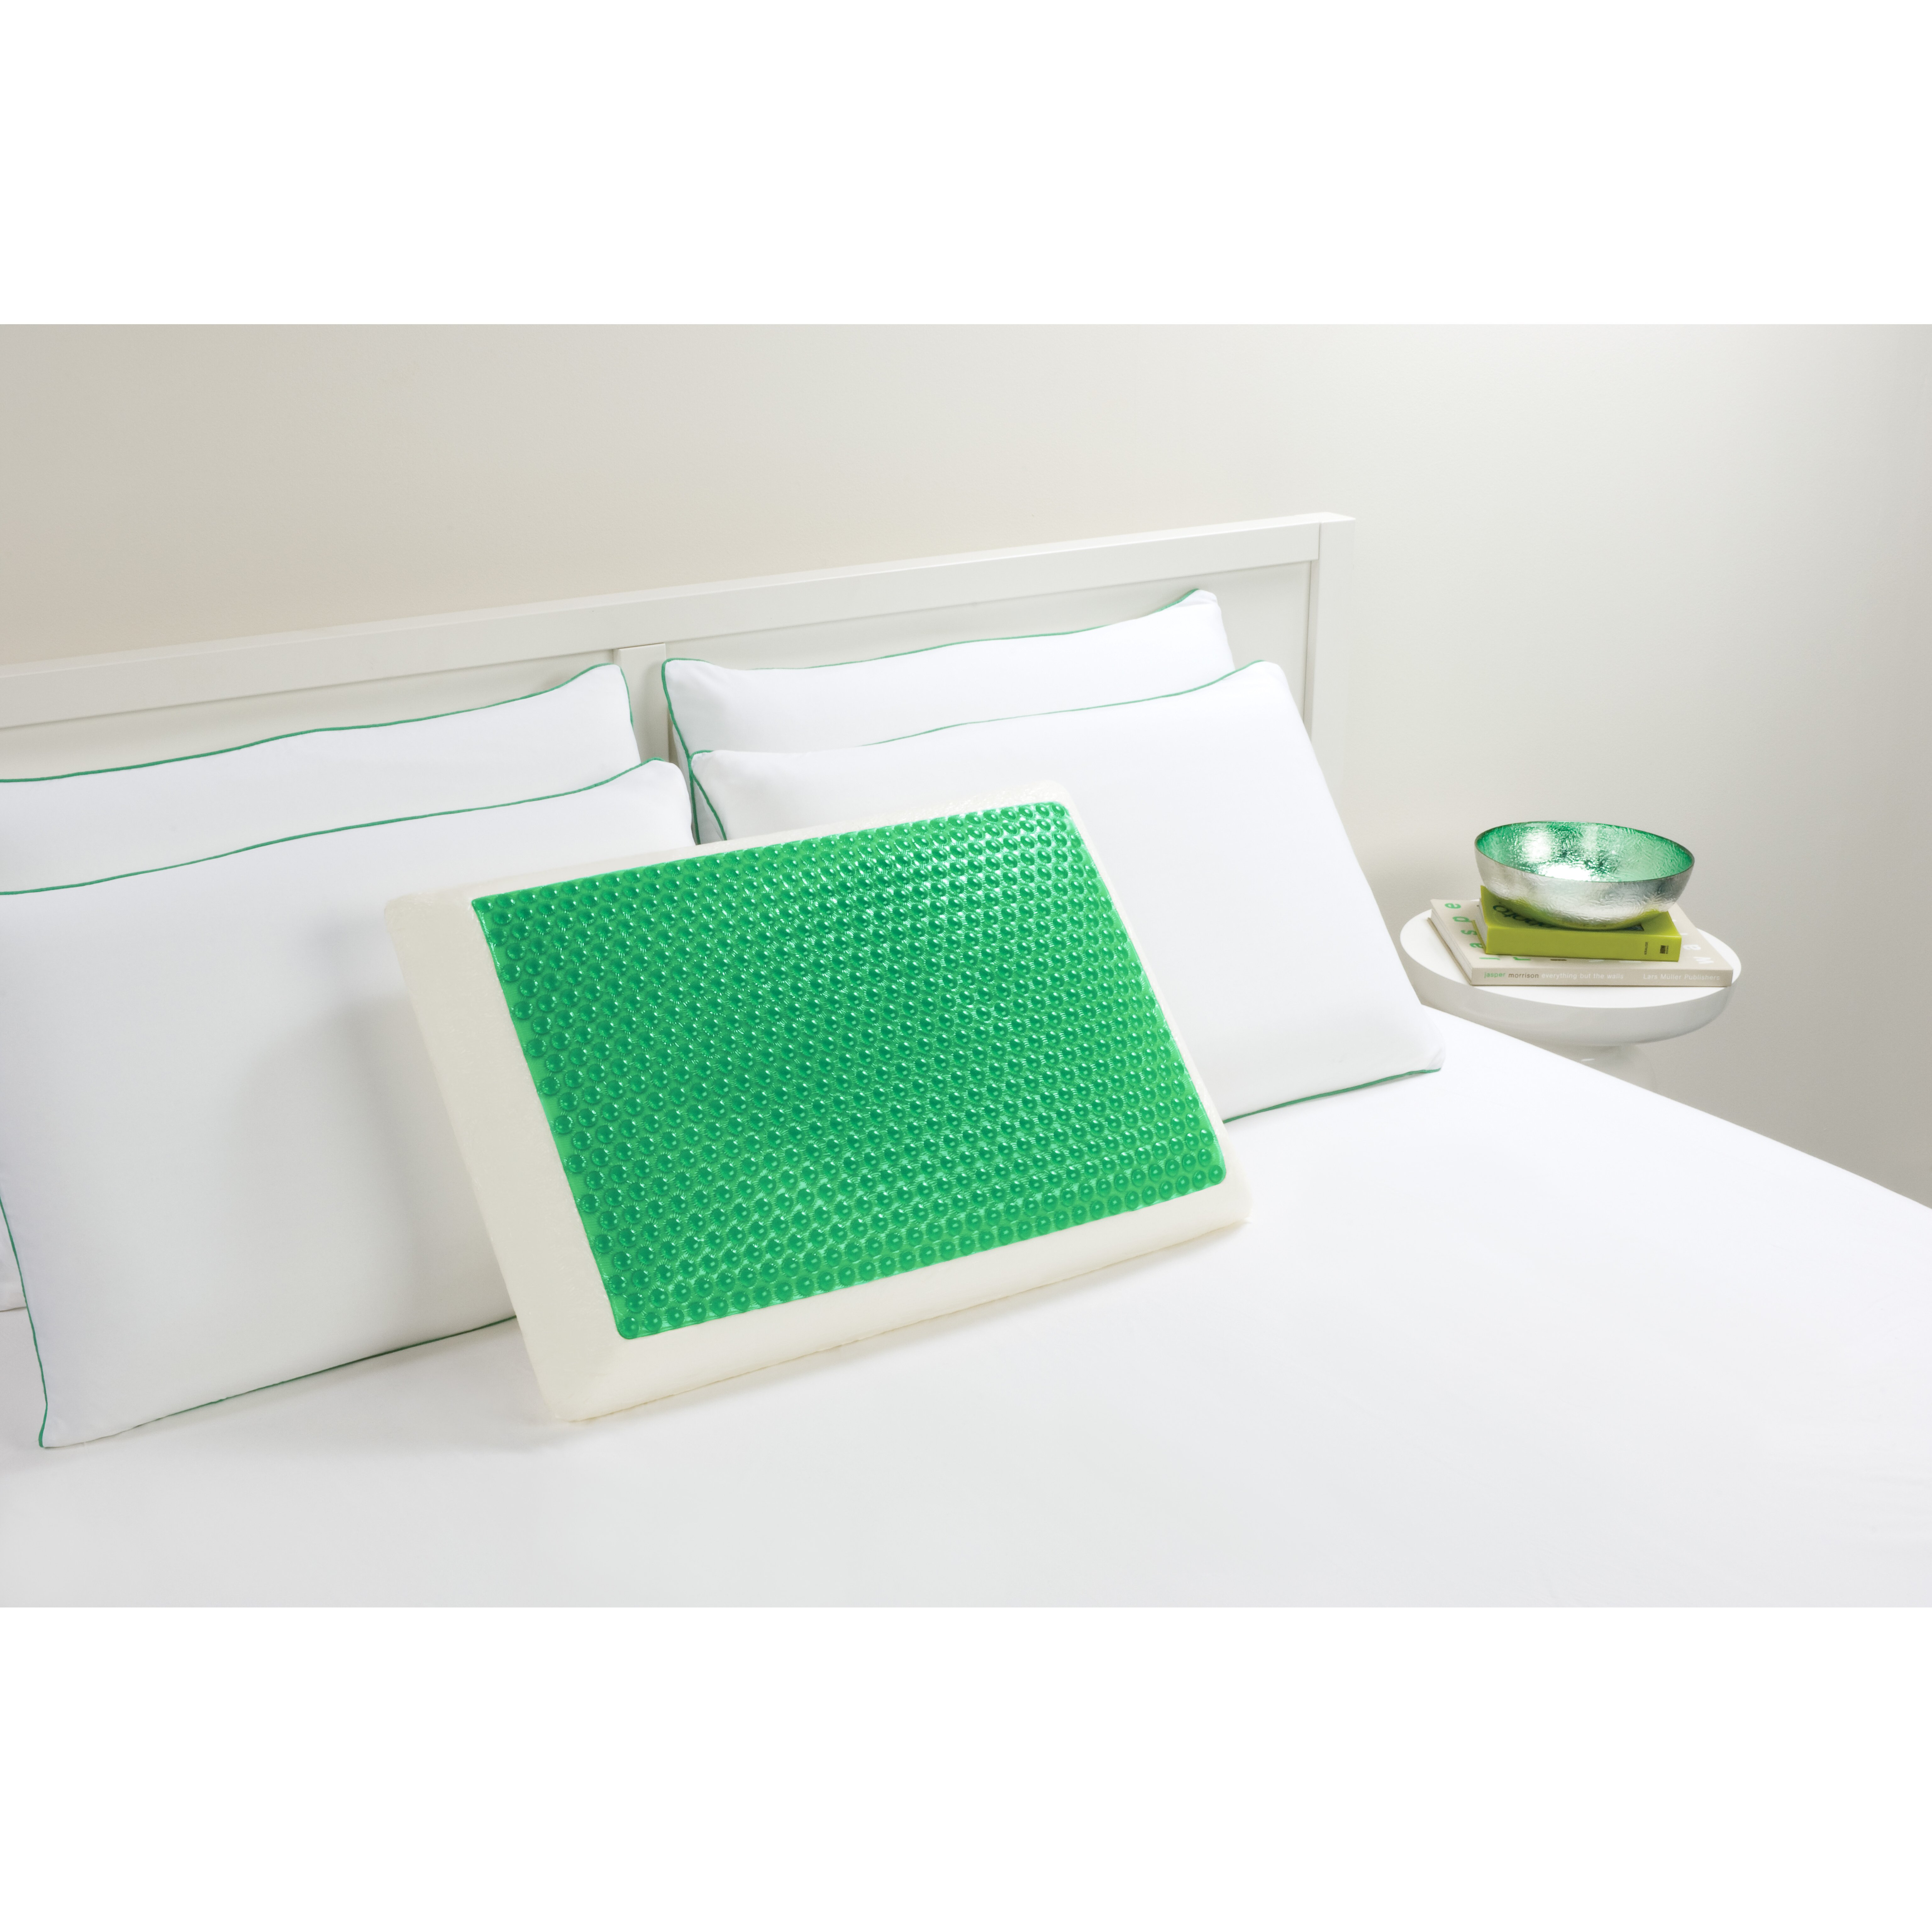 fort Revolution Bubble Bed Memory Foam Standard Pillow